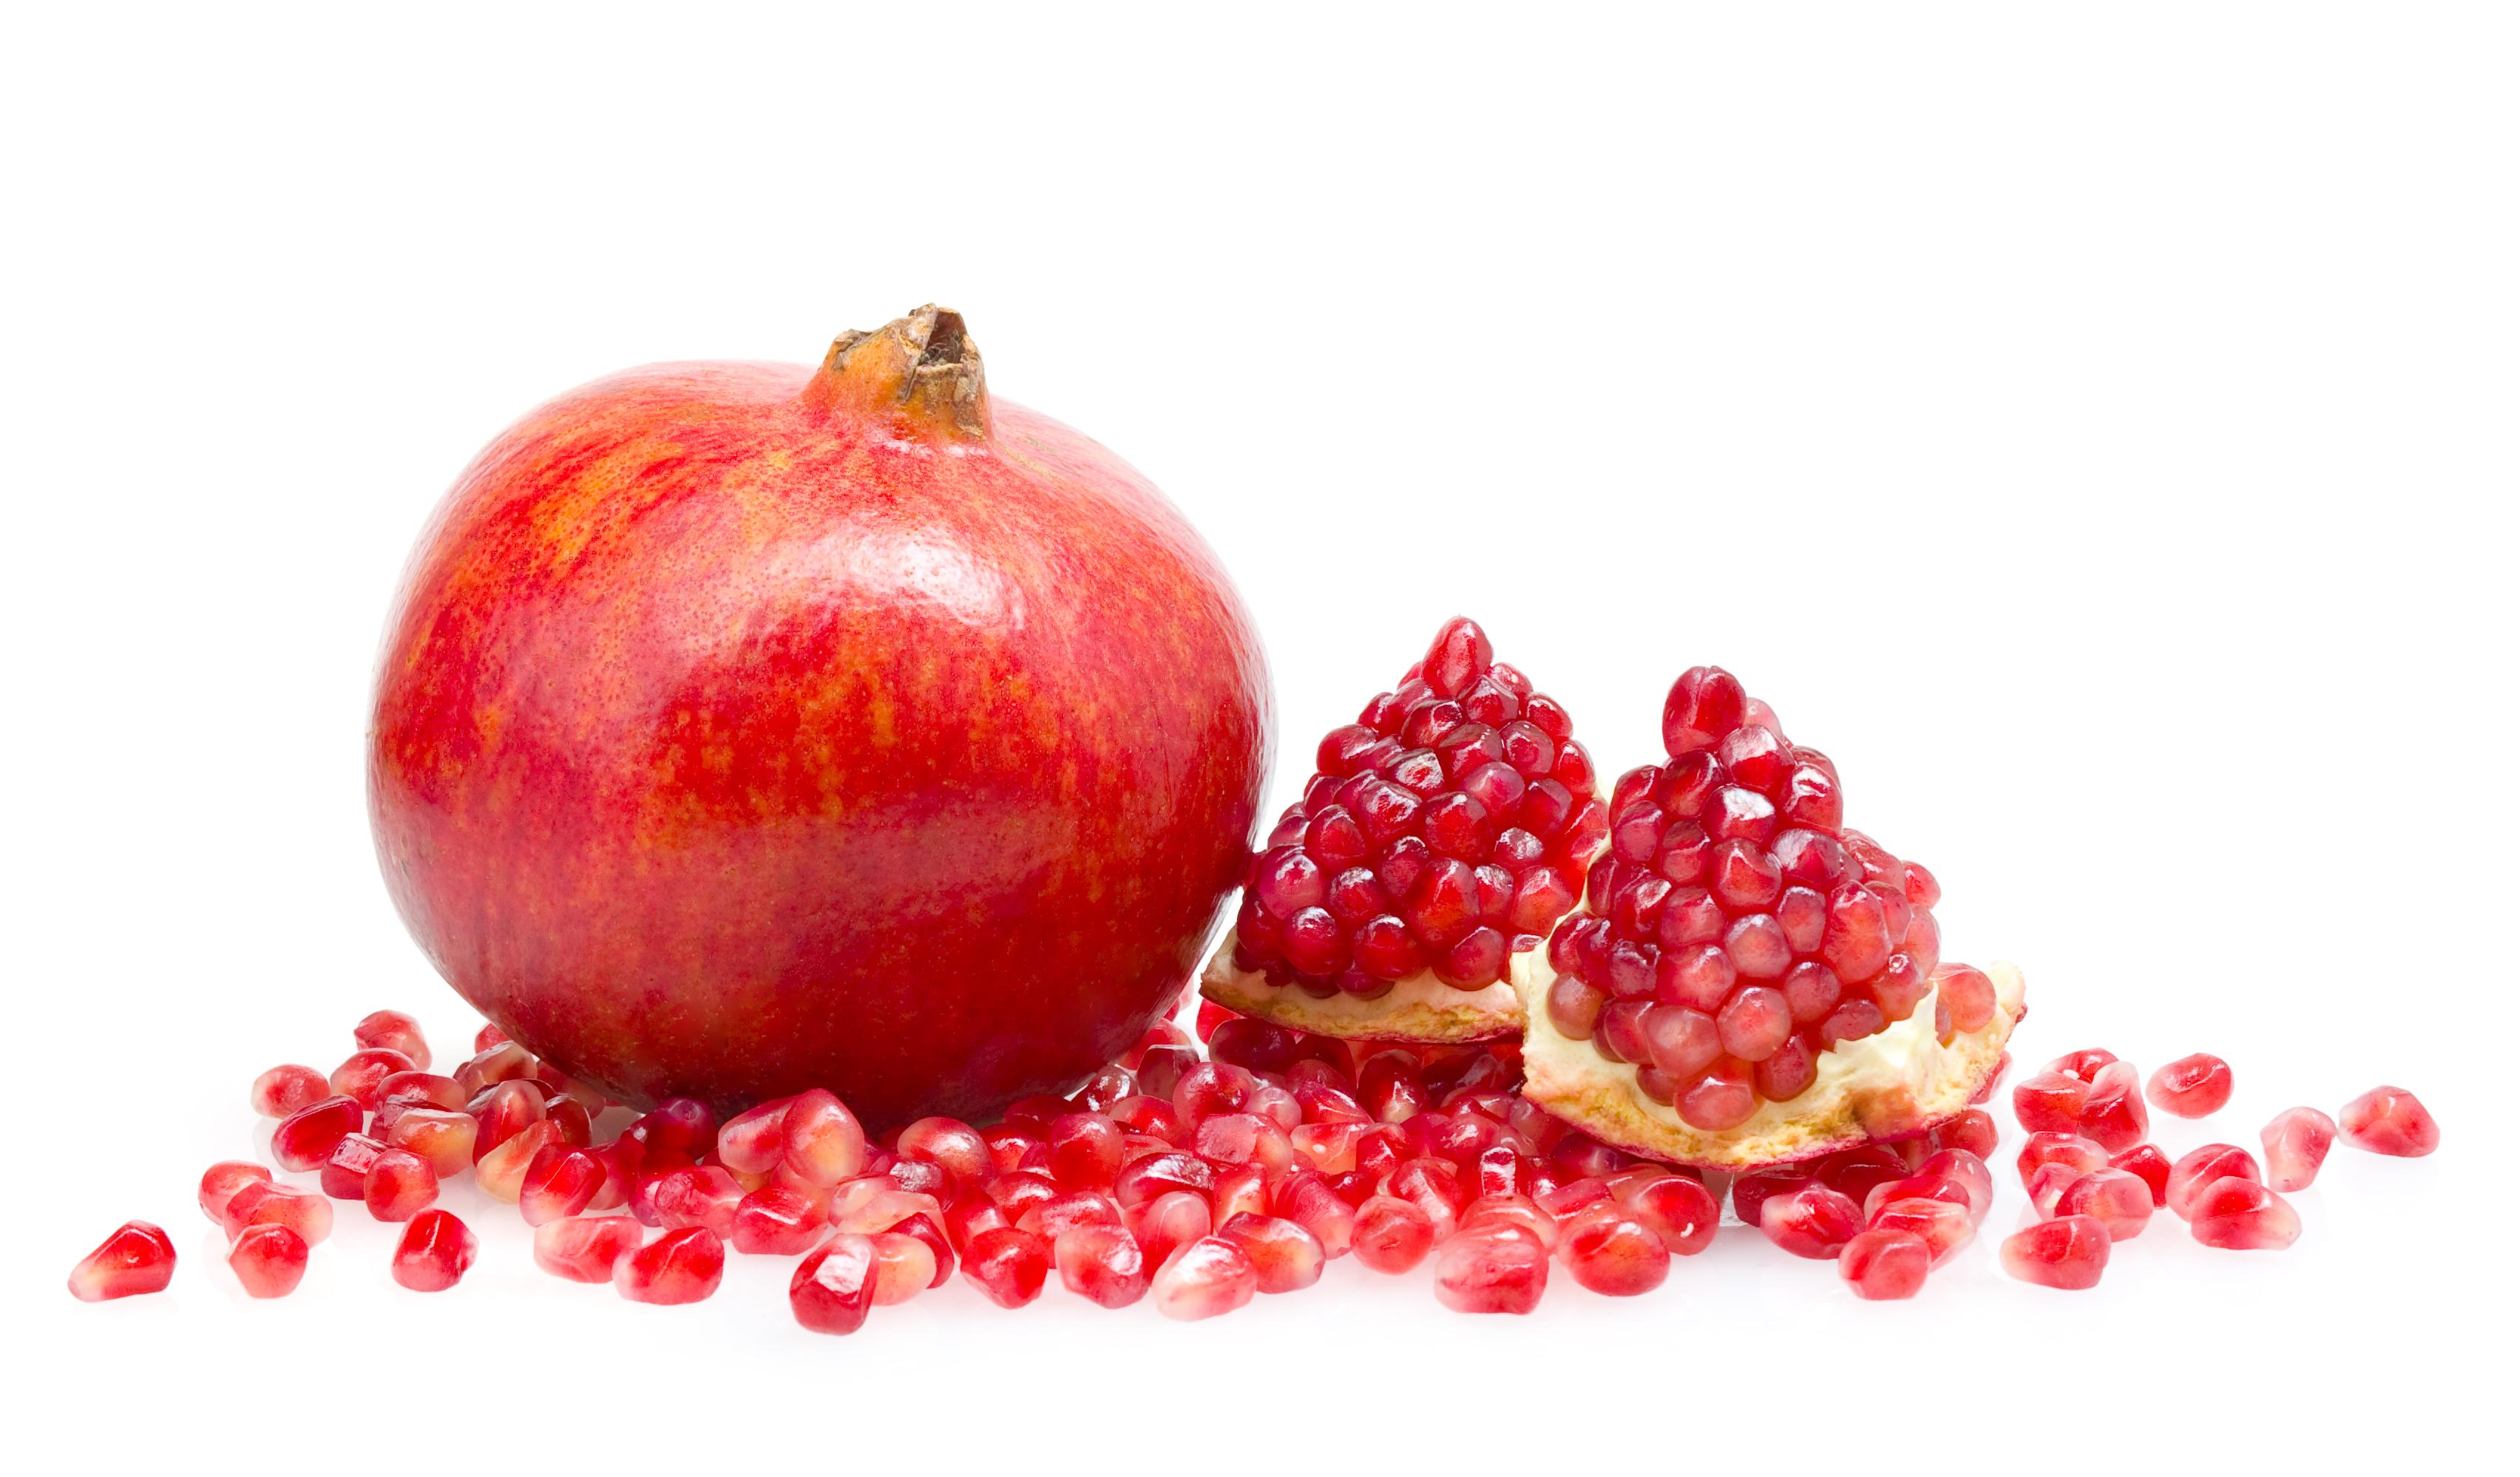 High Resolution Wallpaper | Pomegranate 3408x1998 px